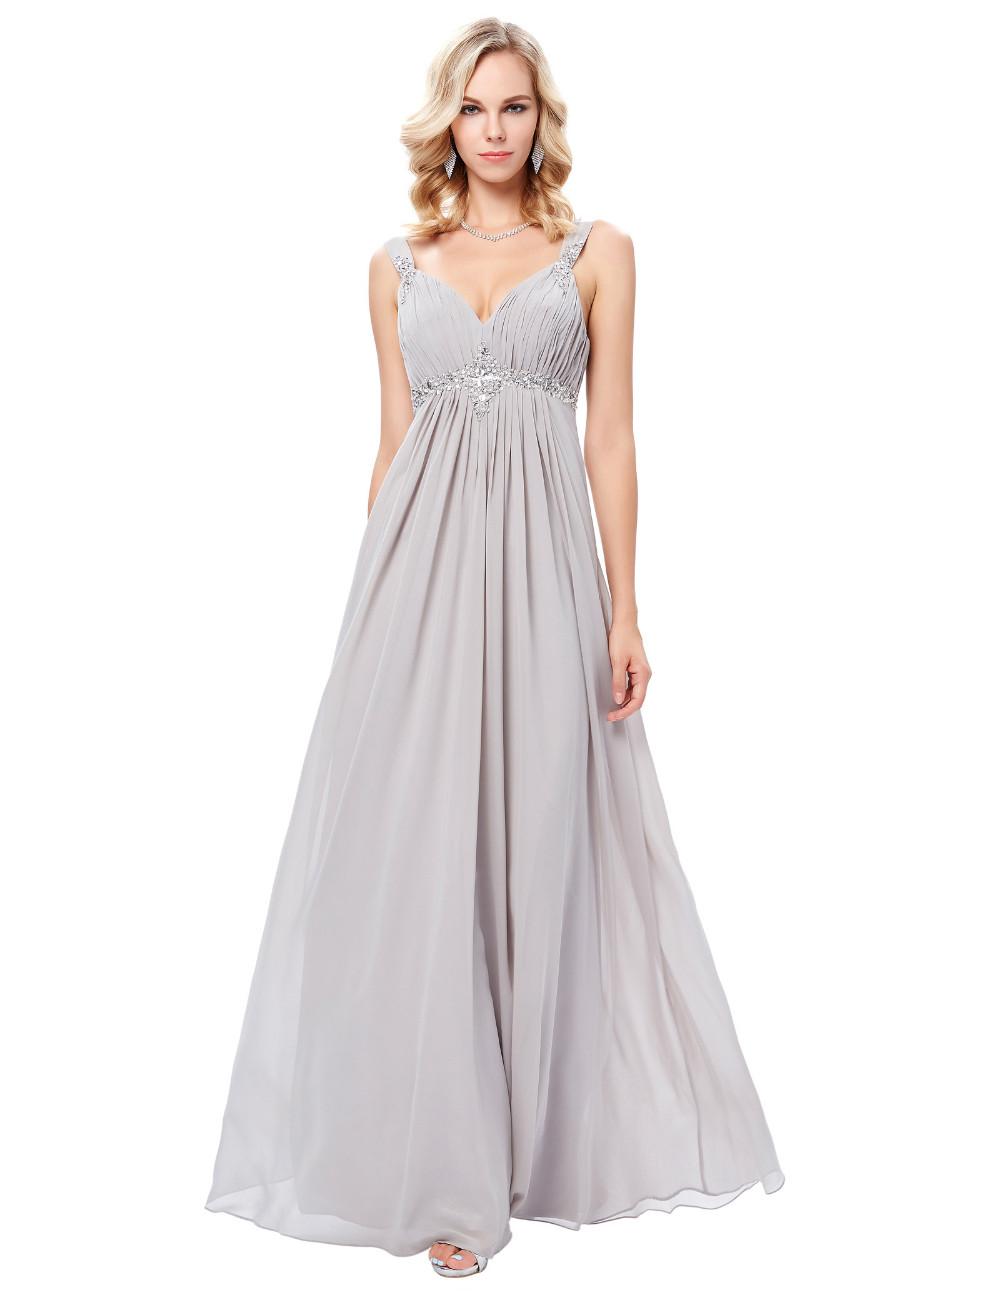 HTB1UiMiOFXXXXX8XFXXq6xXFXXXxLong Formal Dress Elegant Floor Length Chiffon Dress